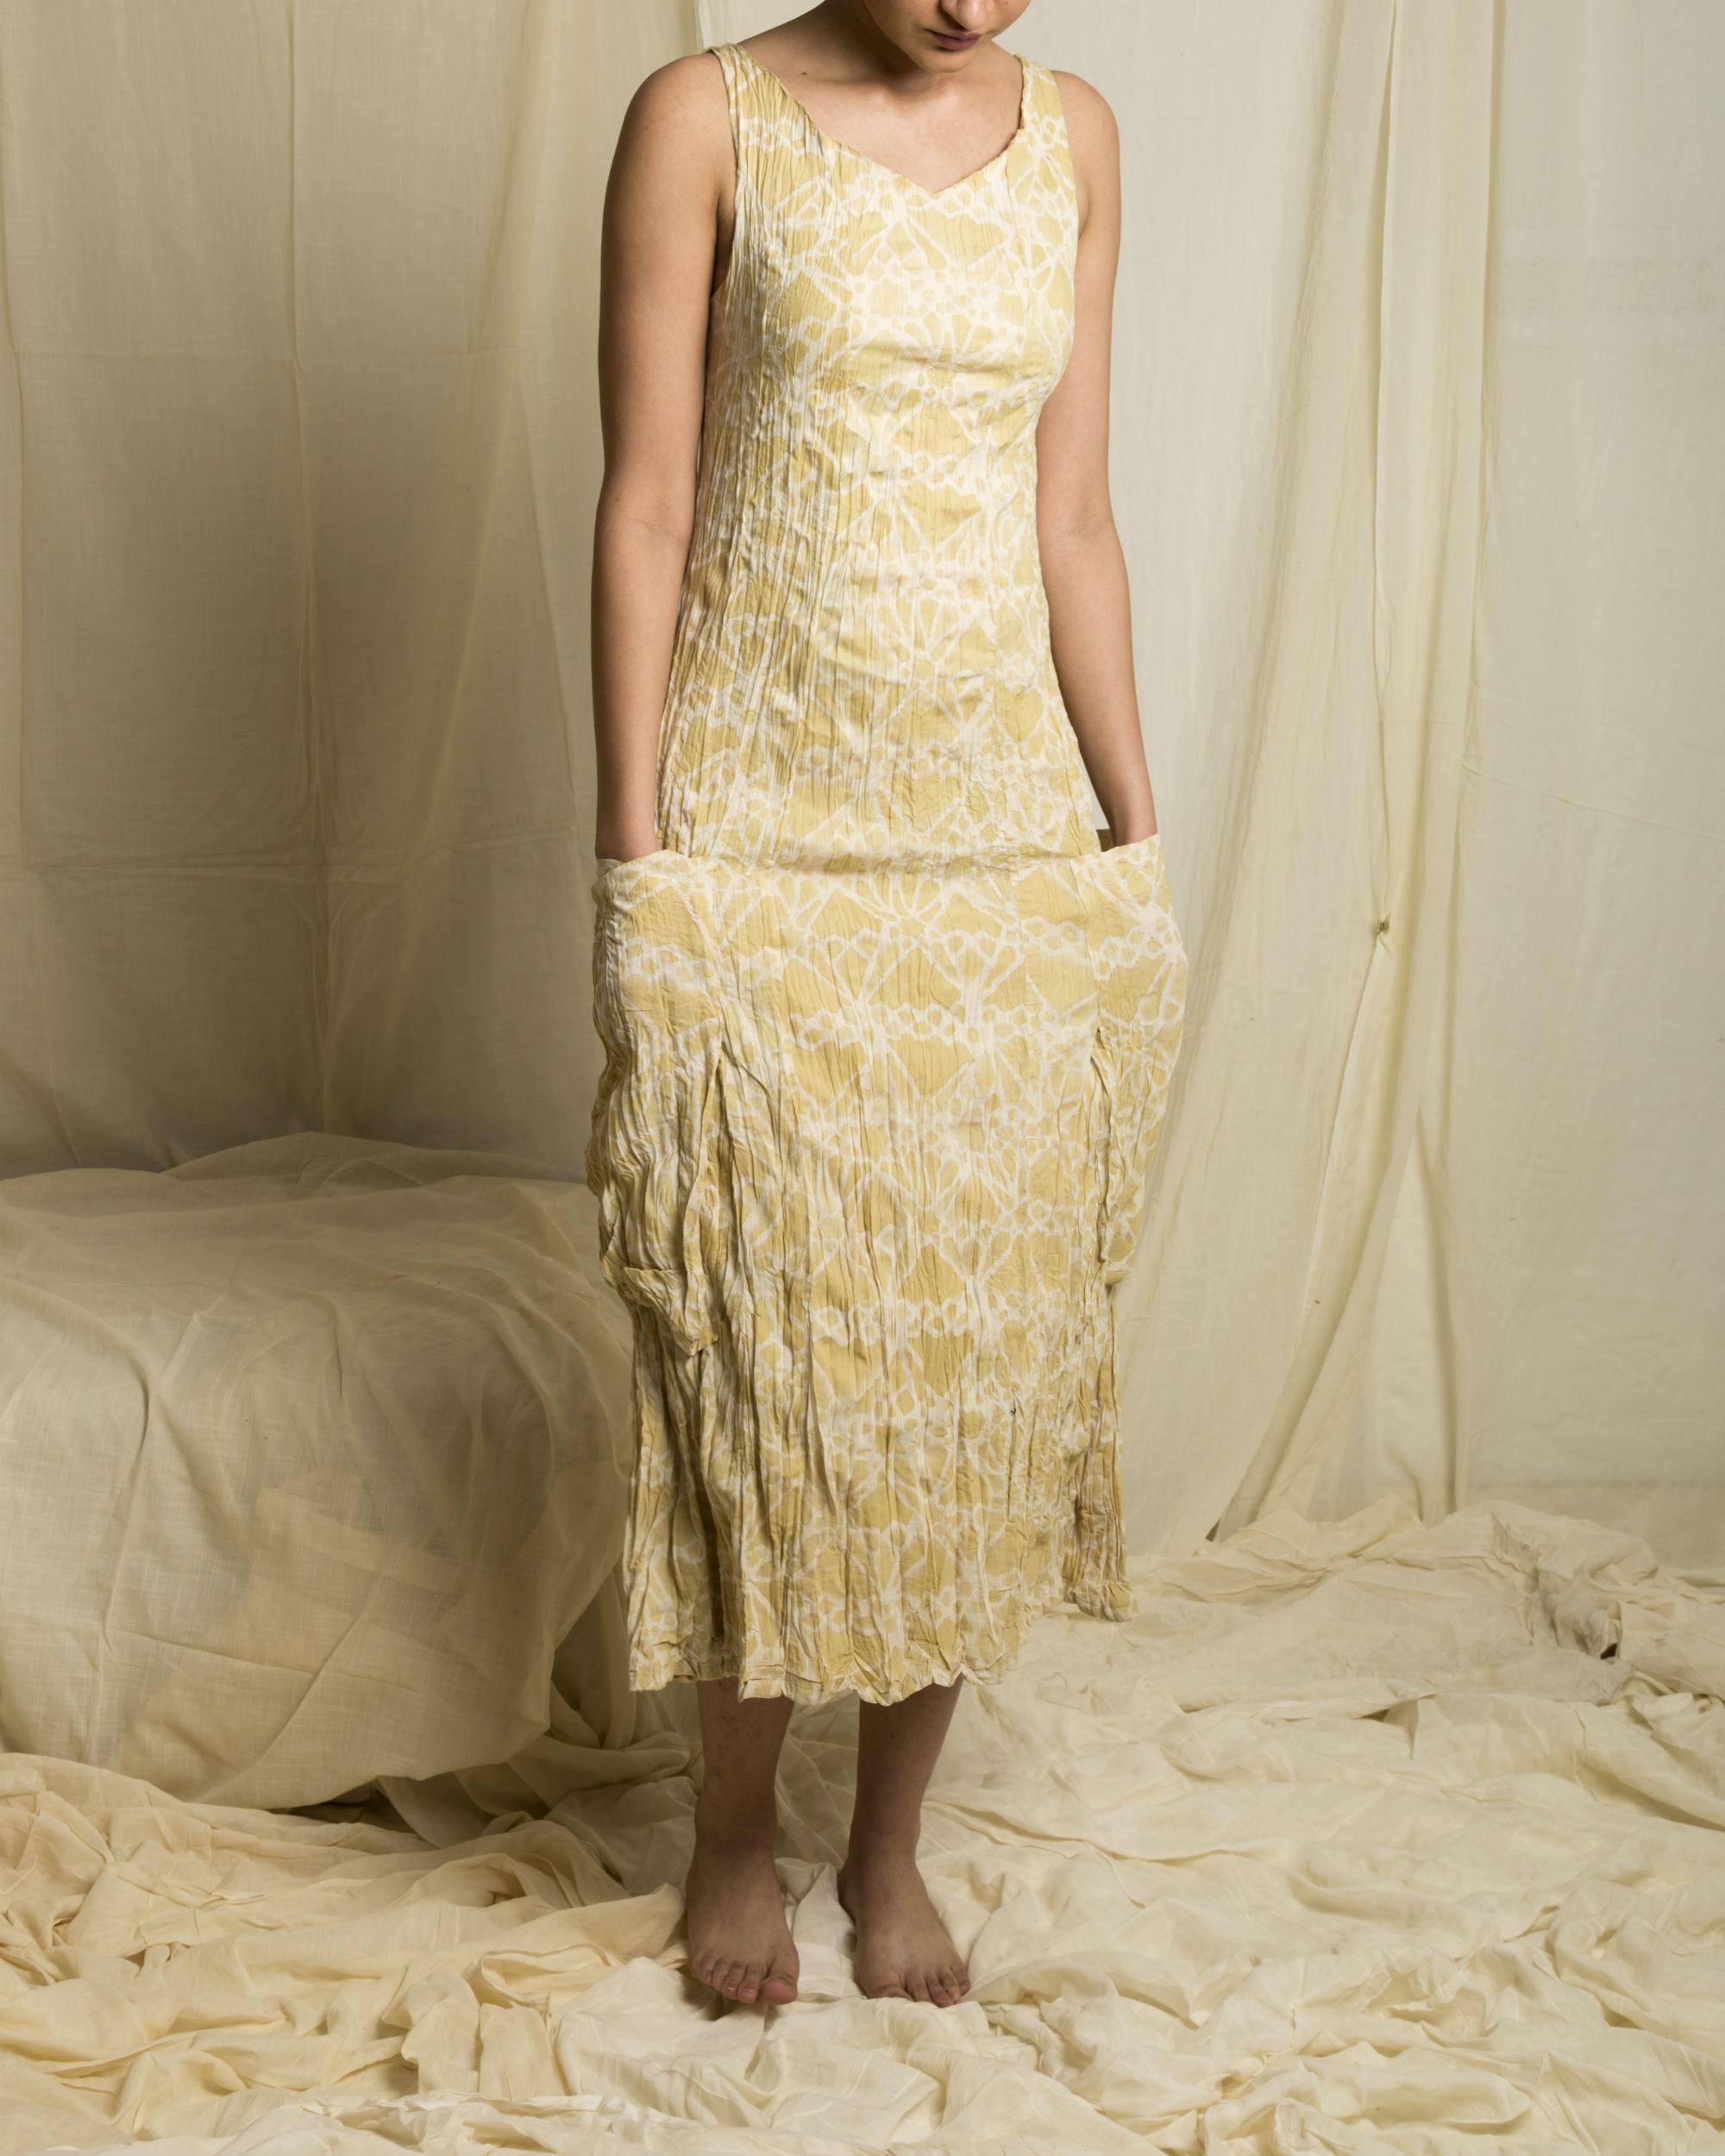 Pale vagabond dress